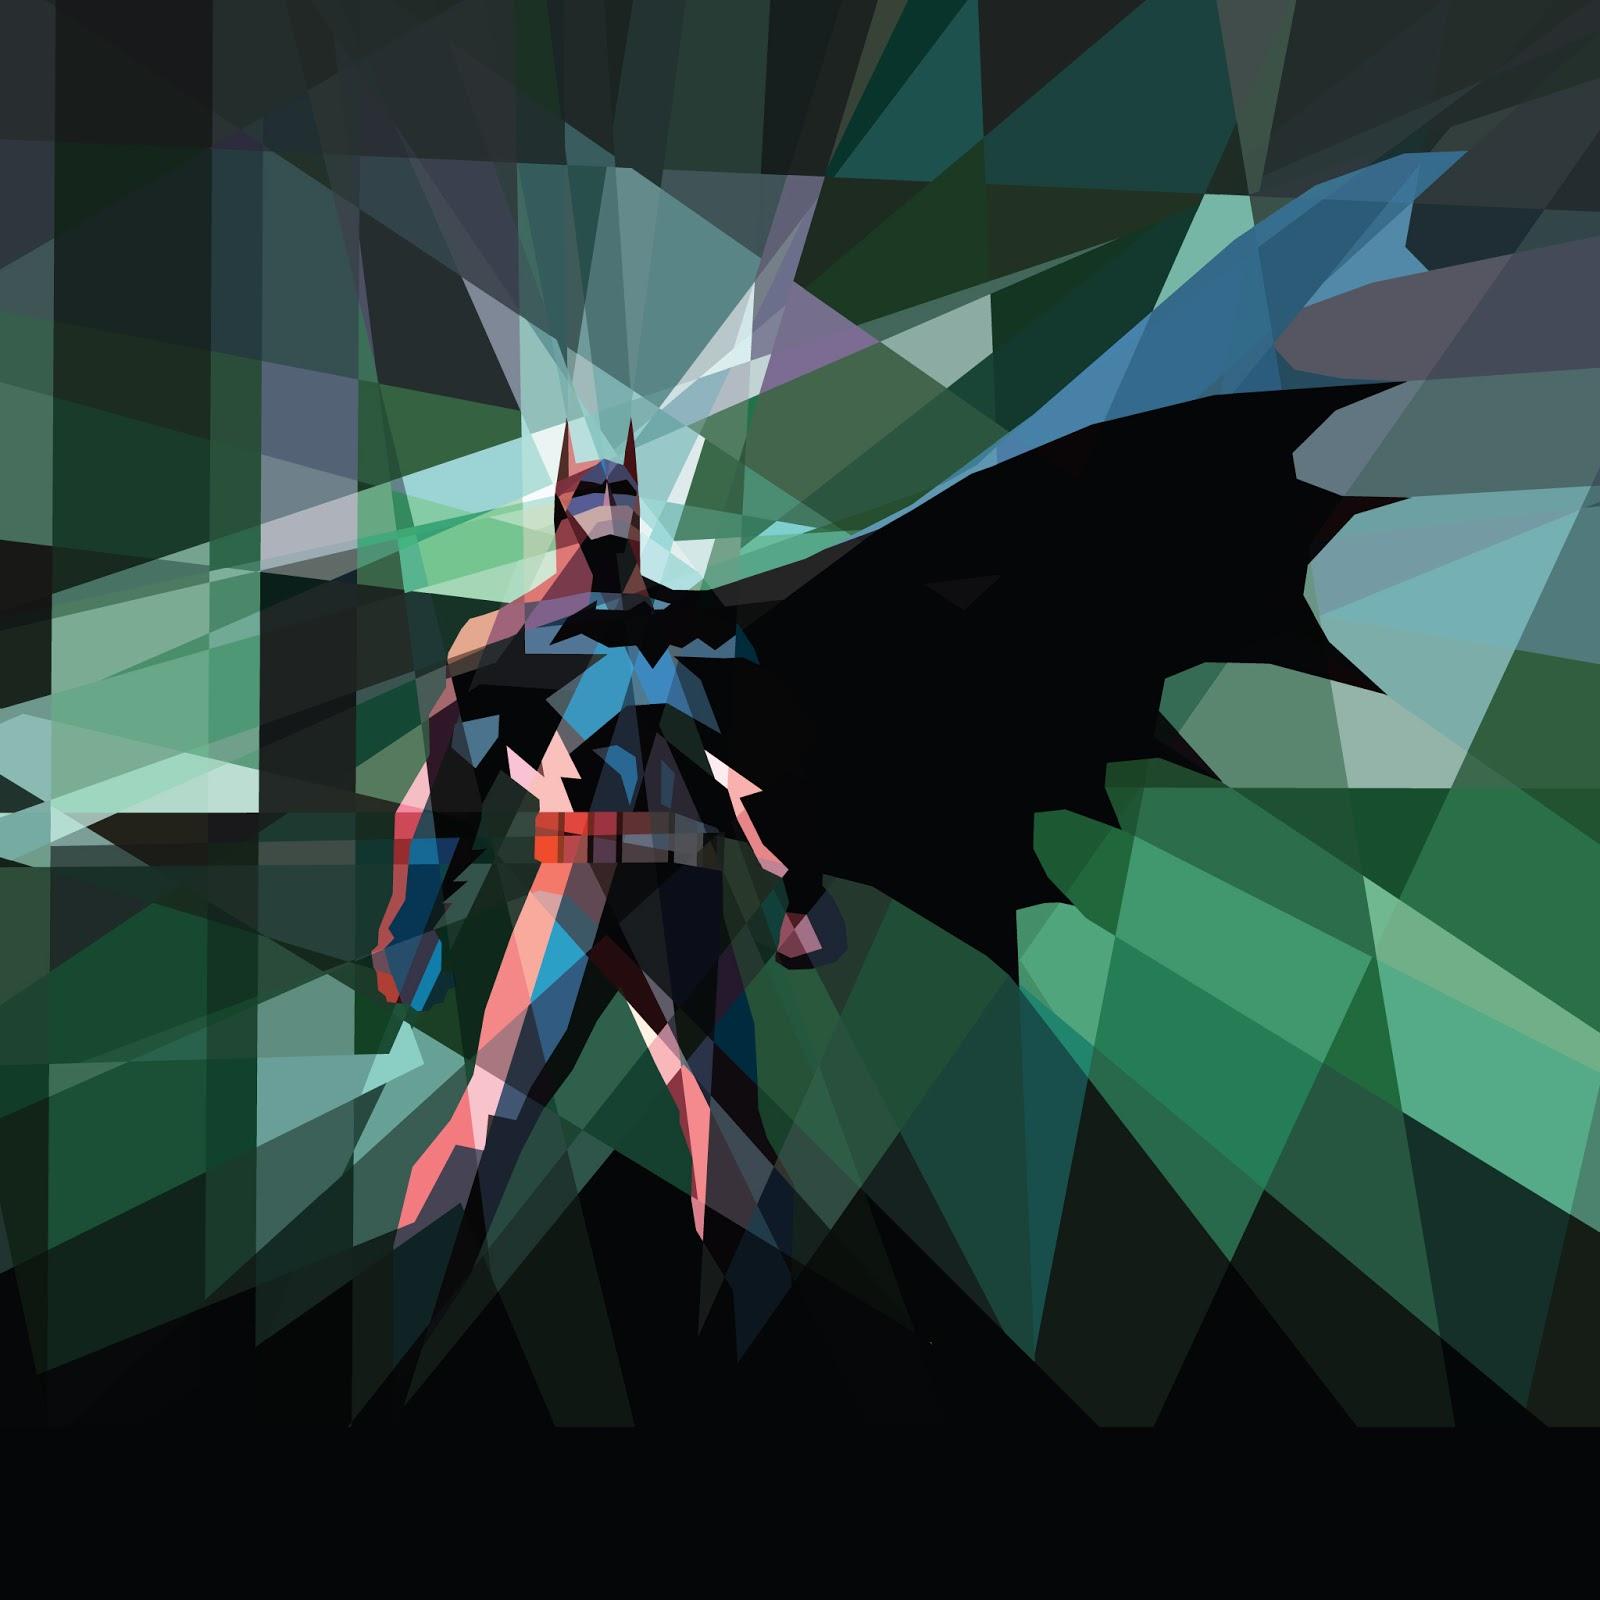 http://1.bp.blogspot.com/--dk7wsMmM9g/UJaGO8RPlNI/AAAAAAAALLw/7Y5jcUOZpzI/s1600/Batman-iPad-wallpaper-iPad3.jpg